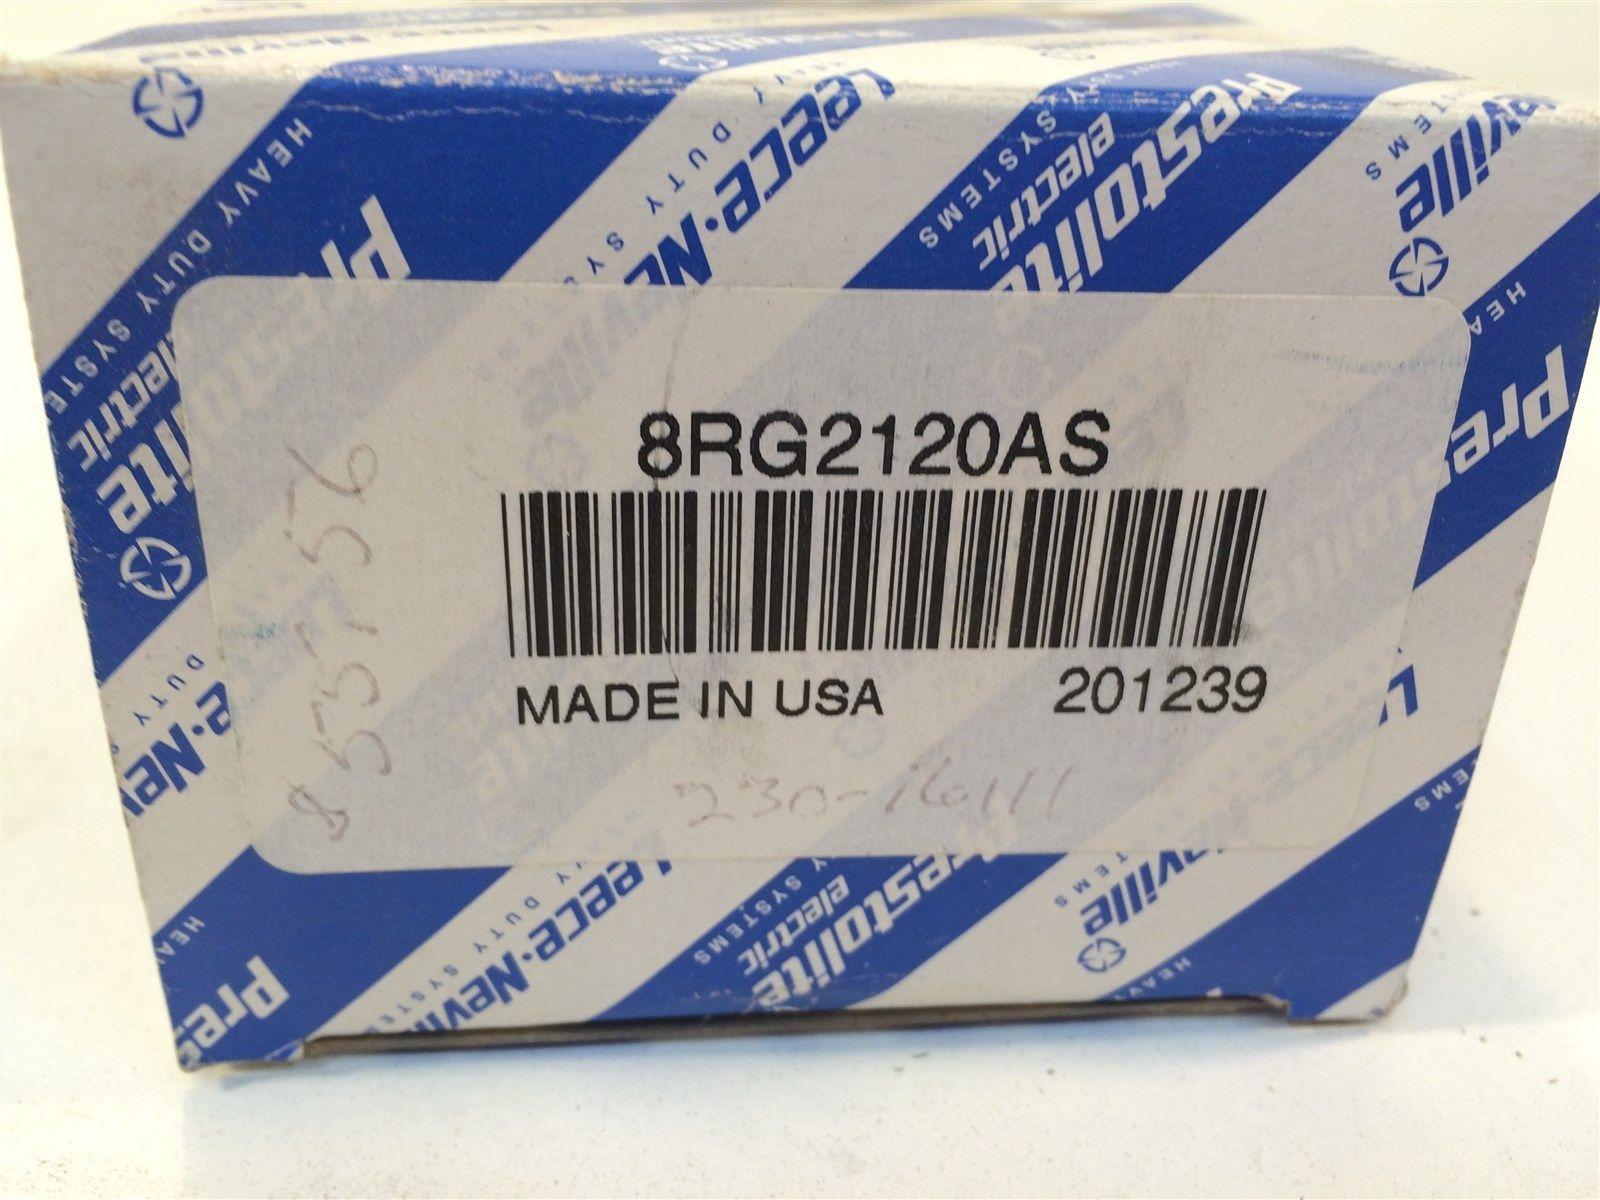 Prestolite 8RG2120A Voltage Regulator and 46 similar items